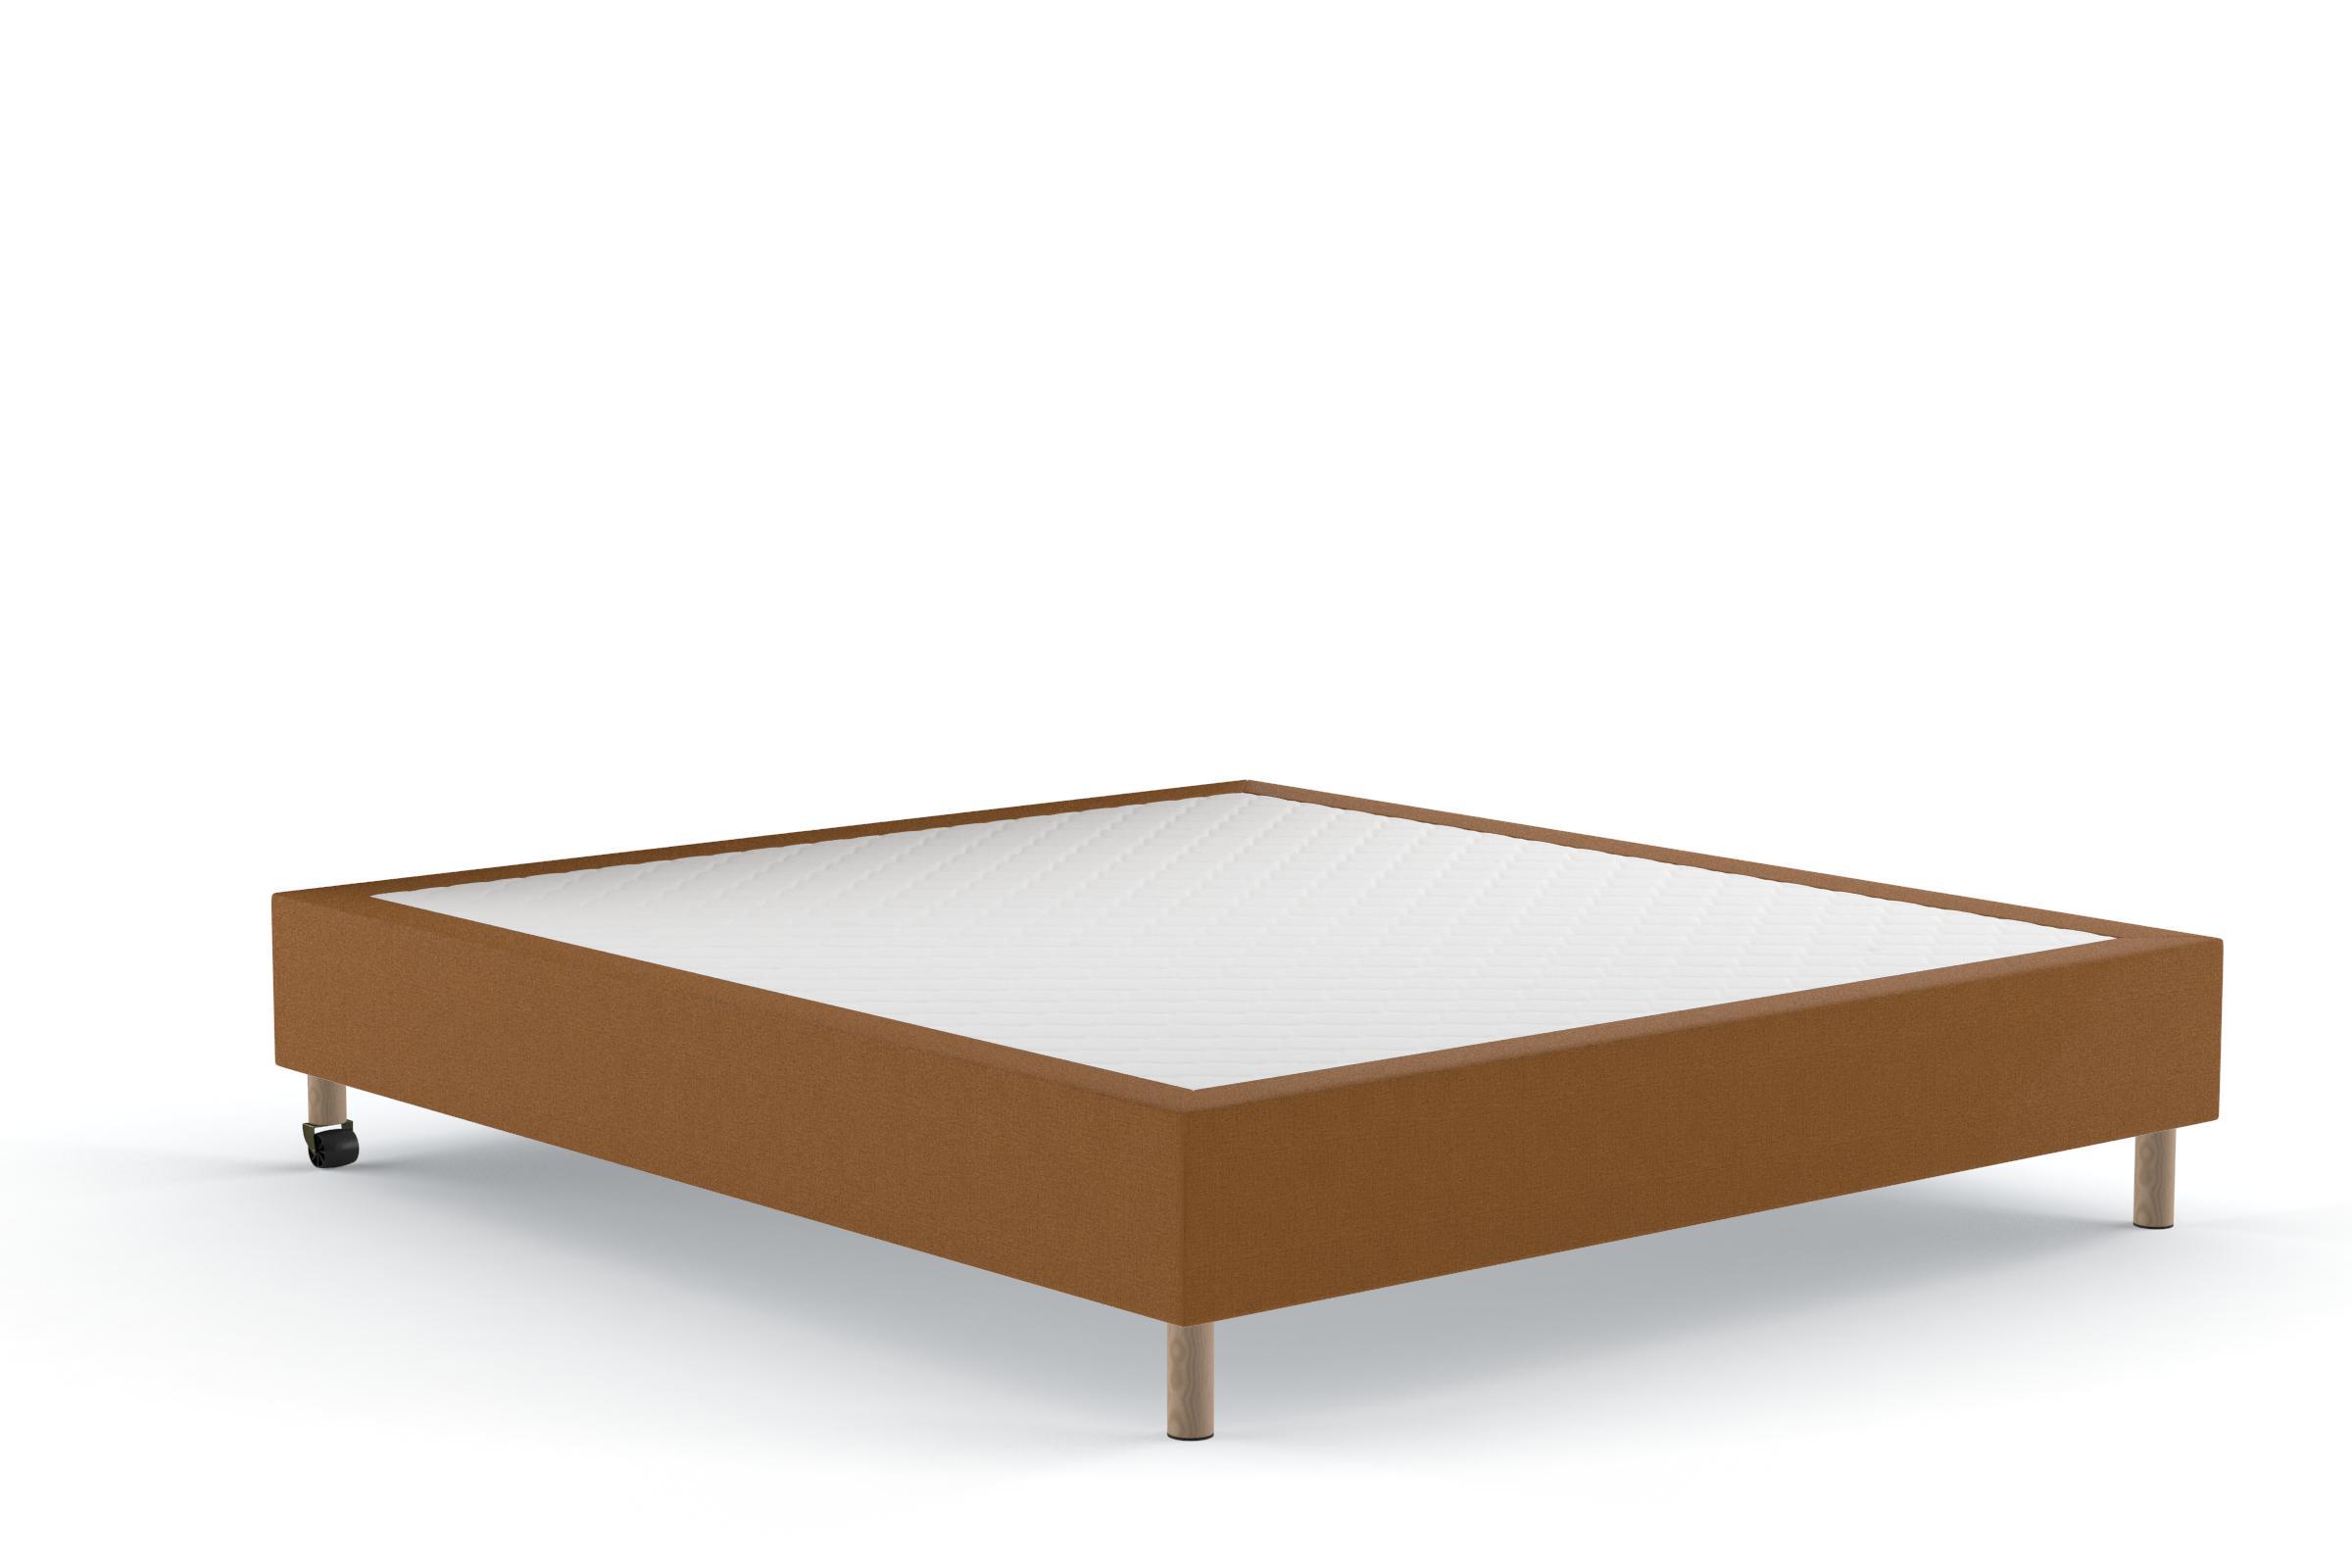 Full Size of Boxspringbett 200x200 Beige Samt 180x200 Savoy Vario Fbf Bedmore Schlafzimmer Set Mit Sofa Wohnzimmer Boxspringbett Beige Samt